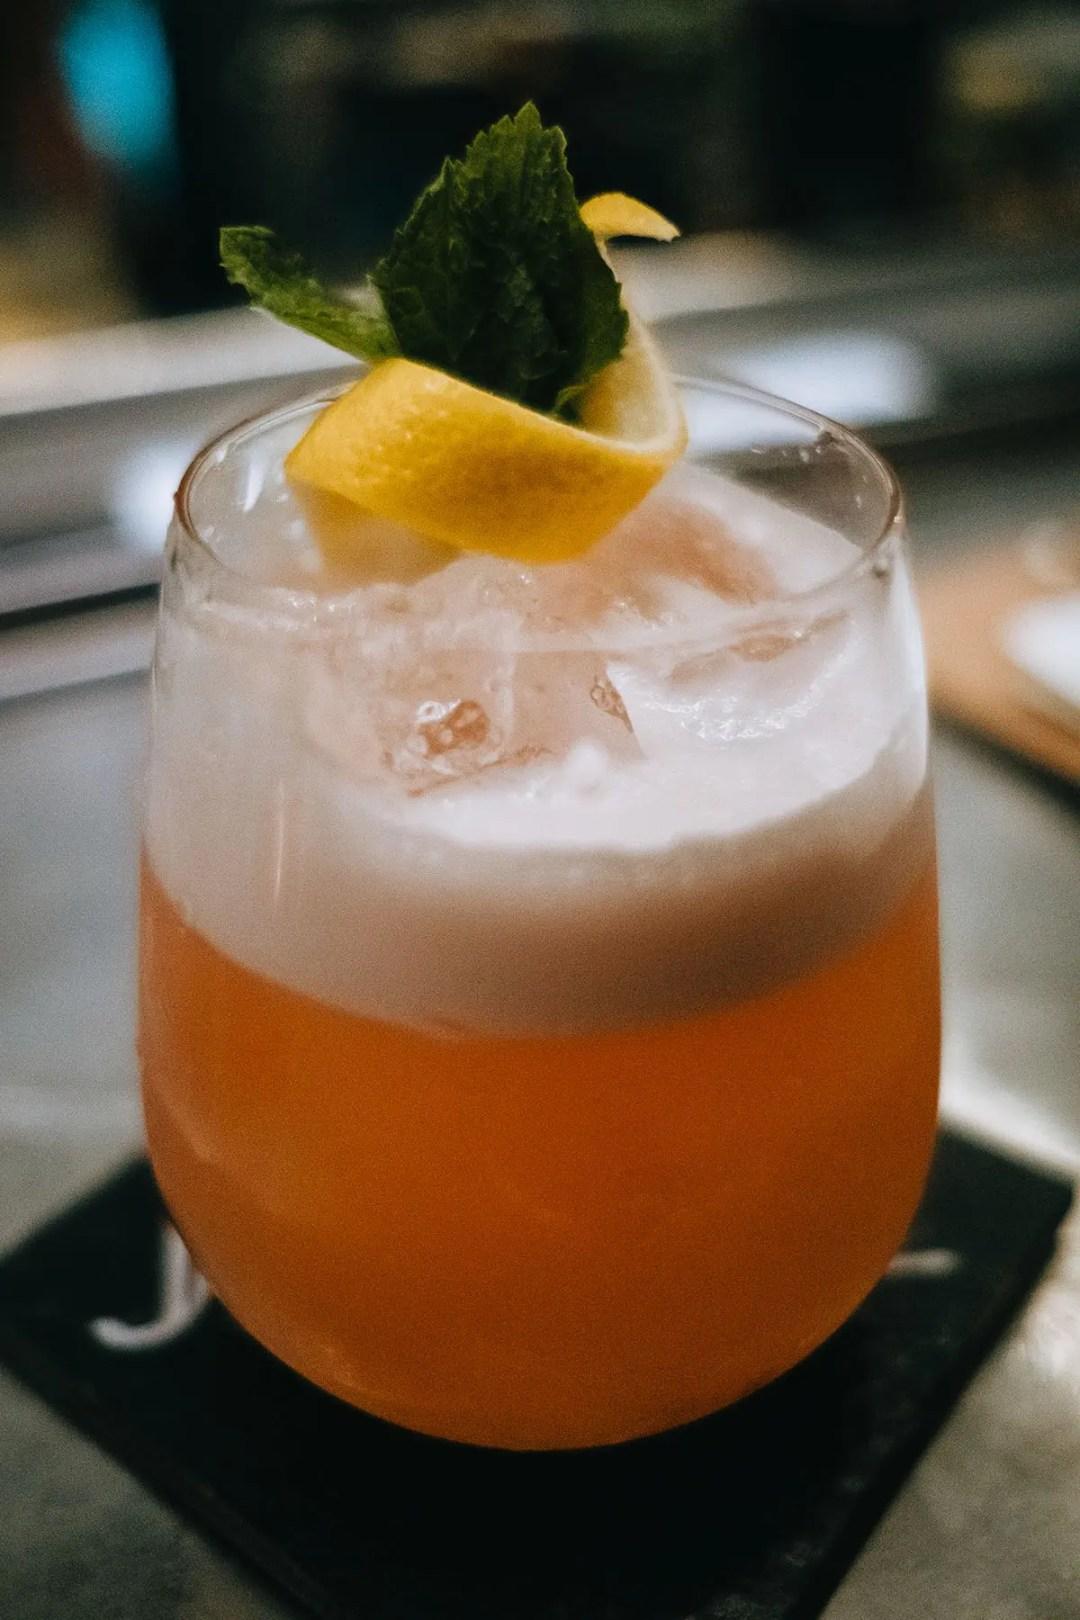 The Blackbird Cocktail at Jungle Cocktail Bar